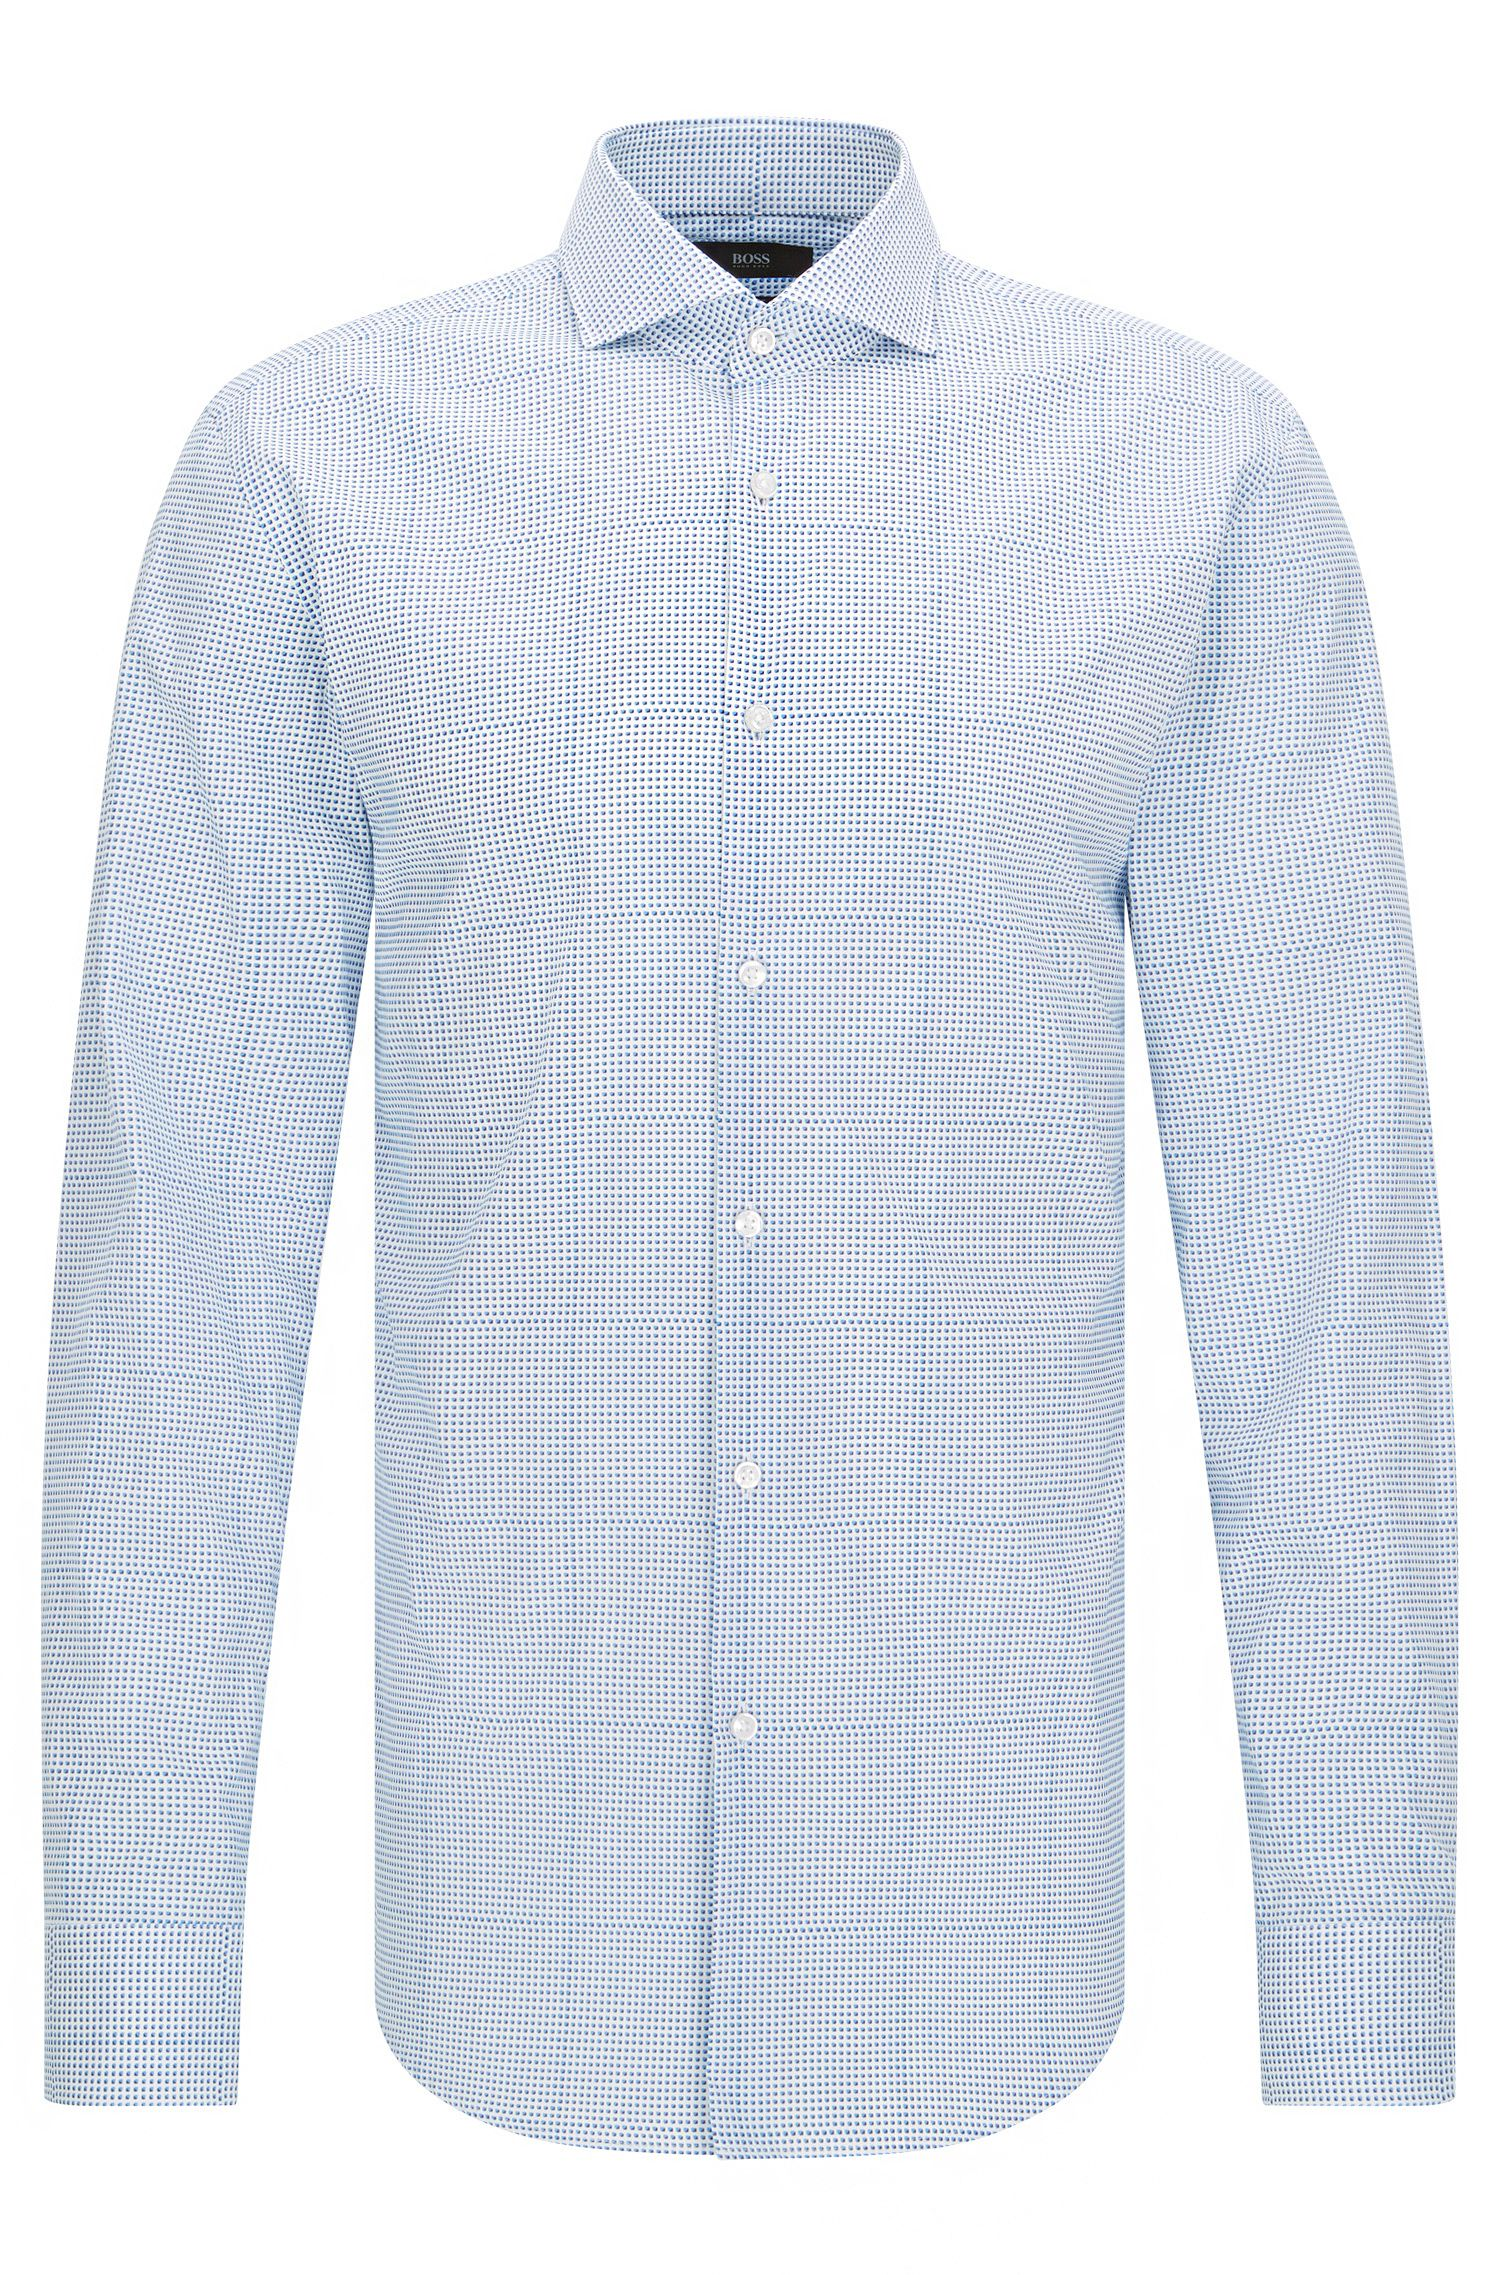 Micro Dot Cotton Dress Shirt, Slim Fit | Jason